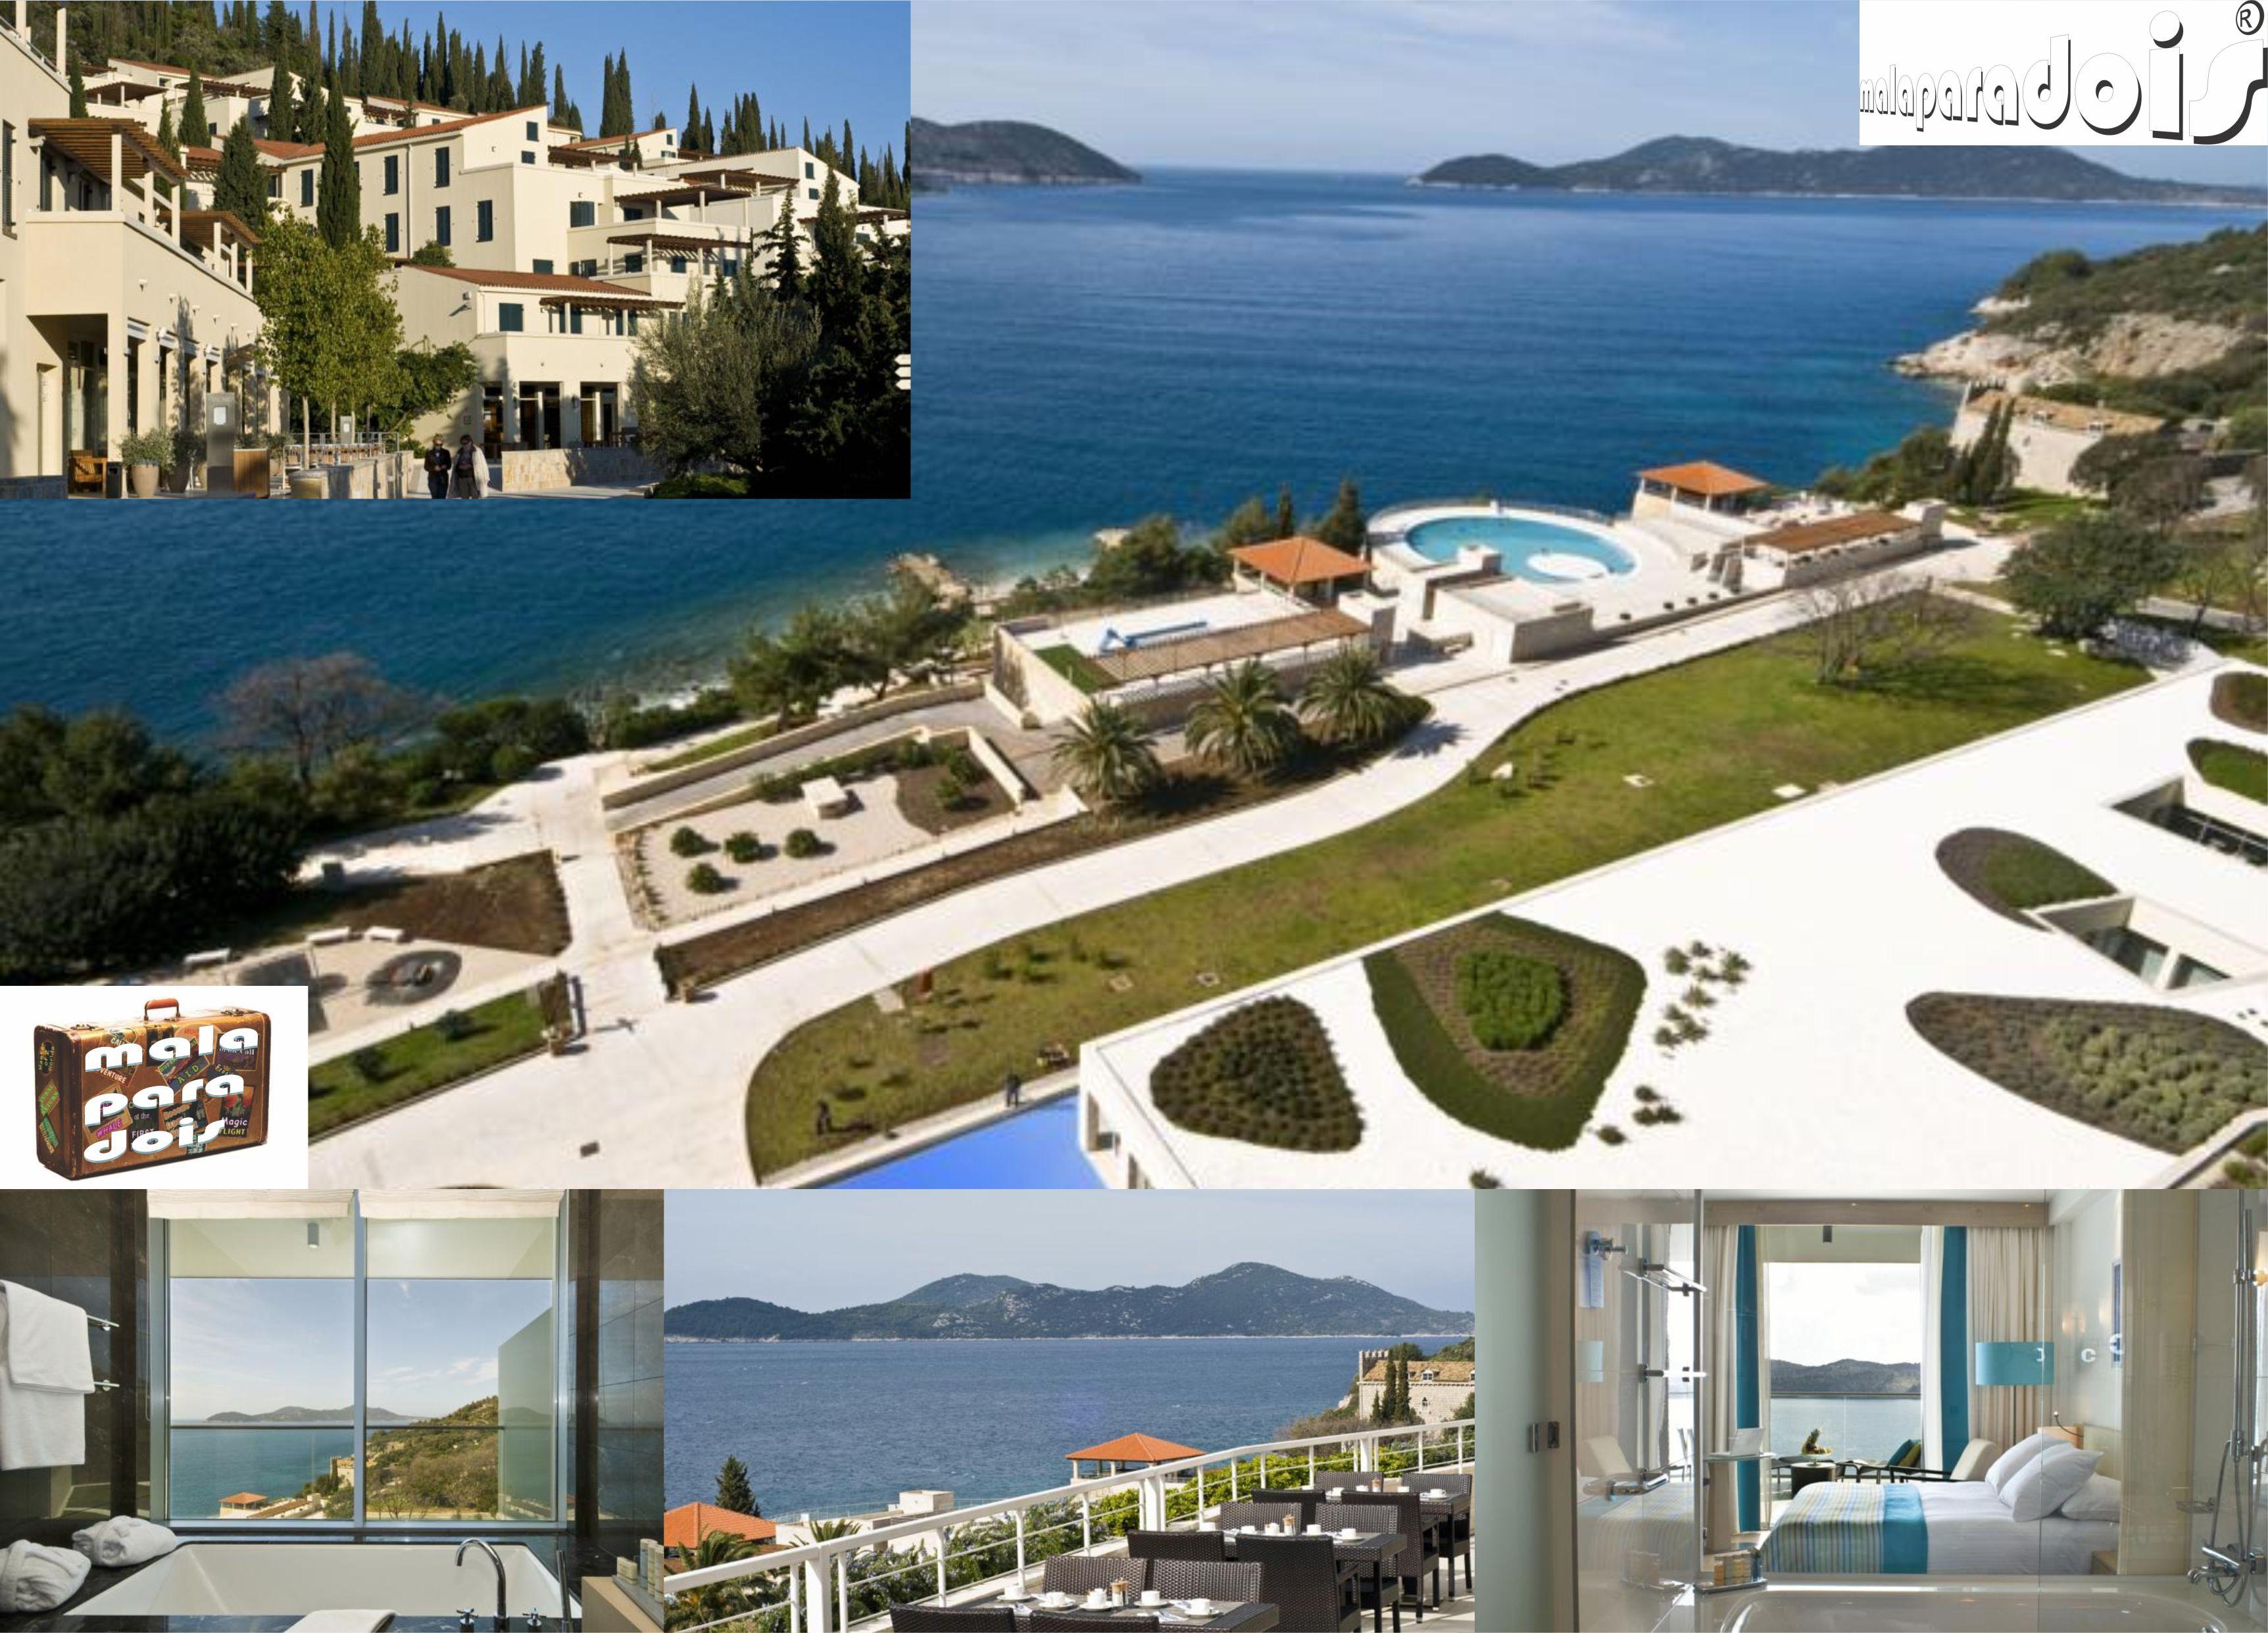 Radisson Blu Resort & Spa, Dubrovnik